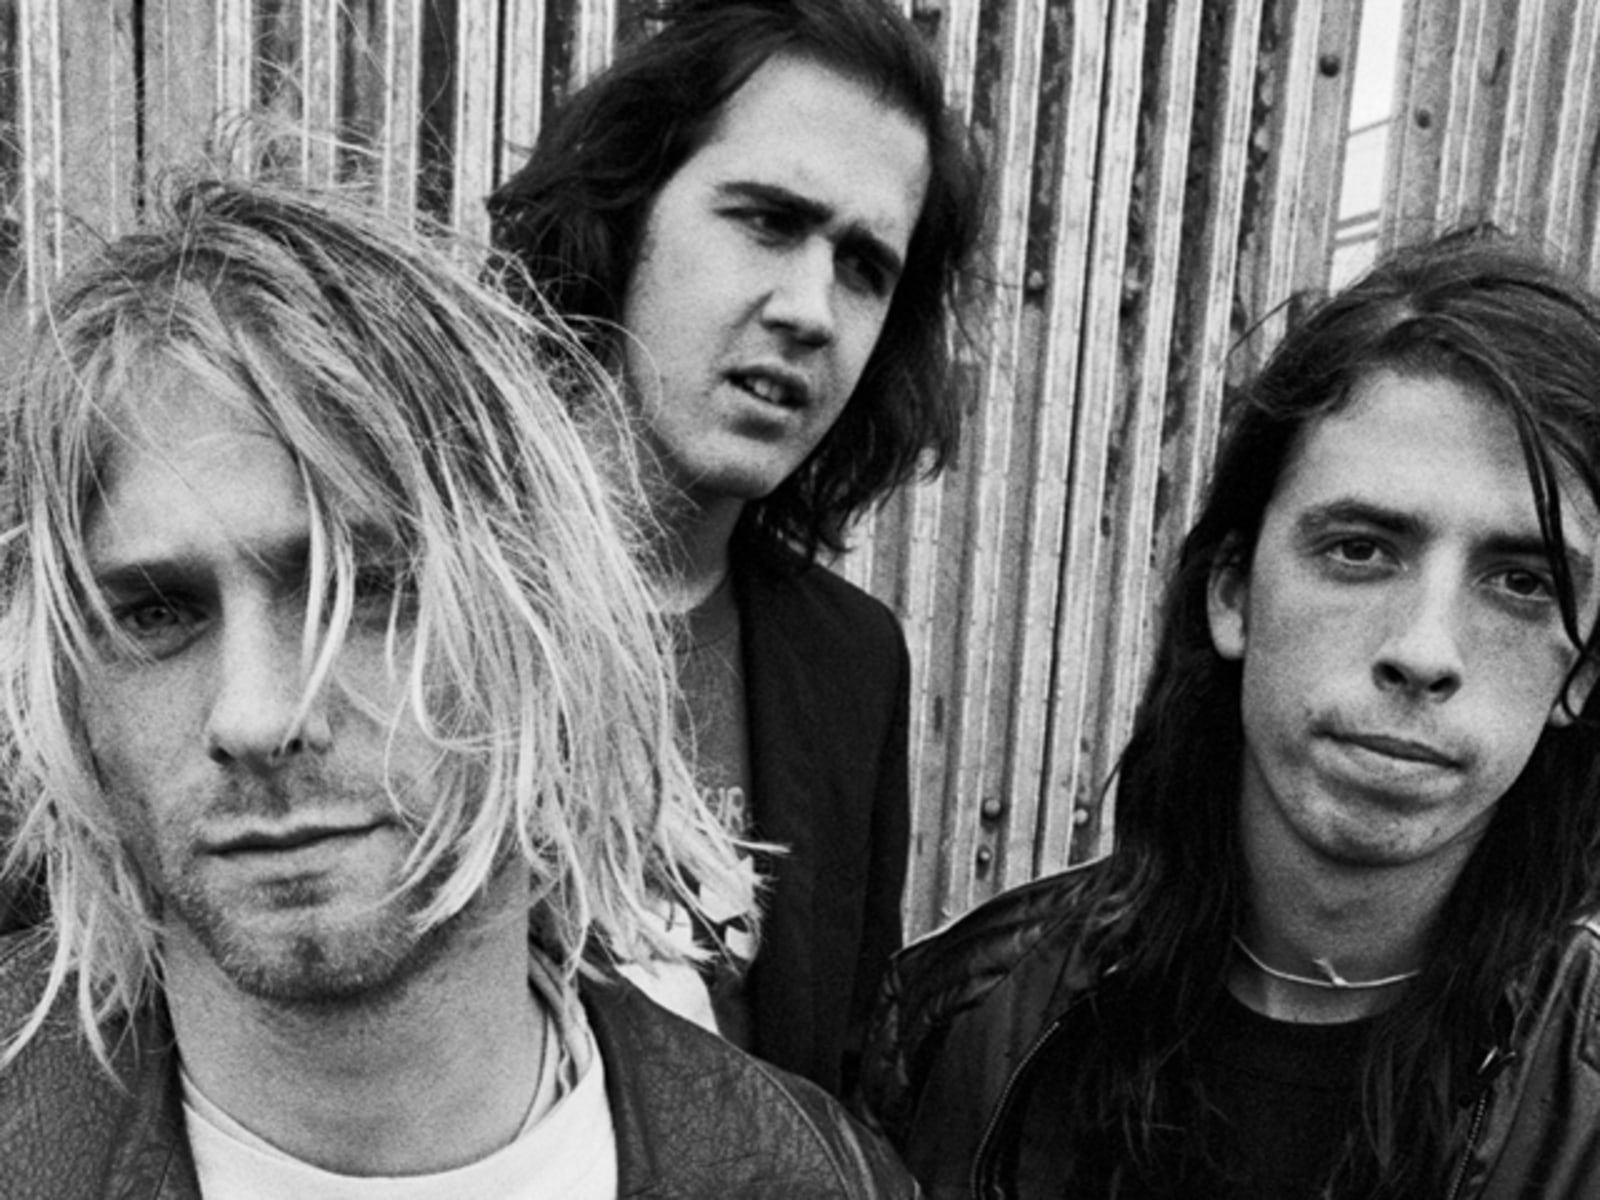 Image: Nirvana